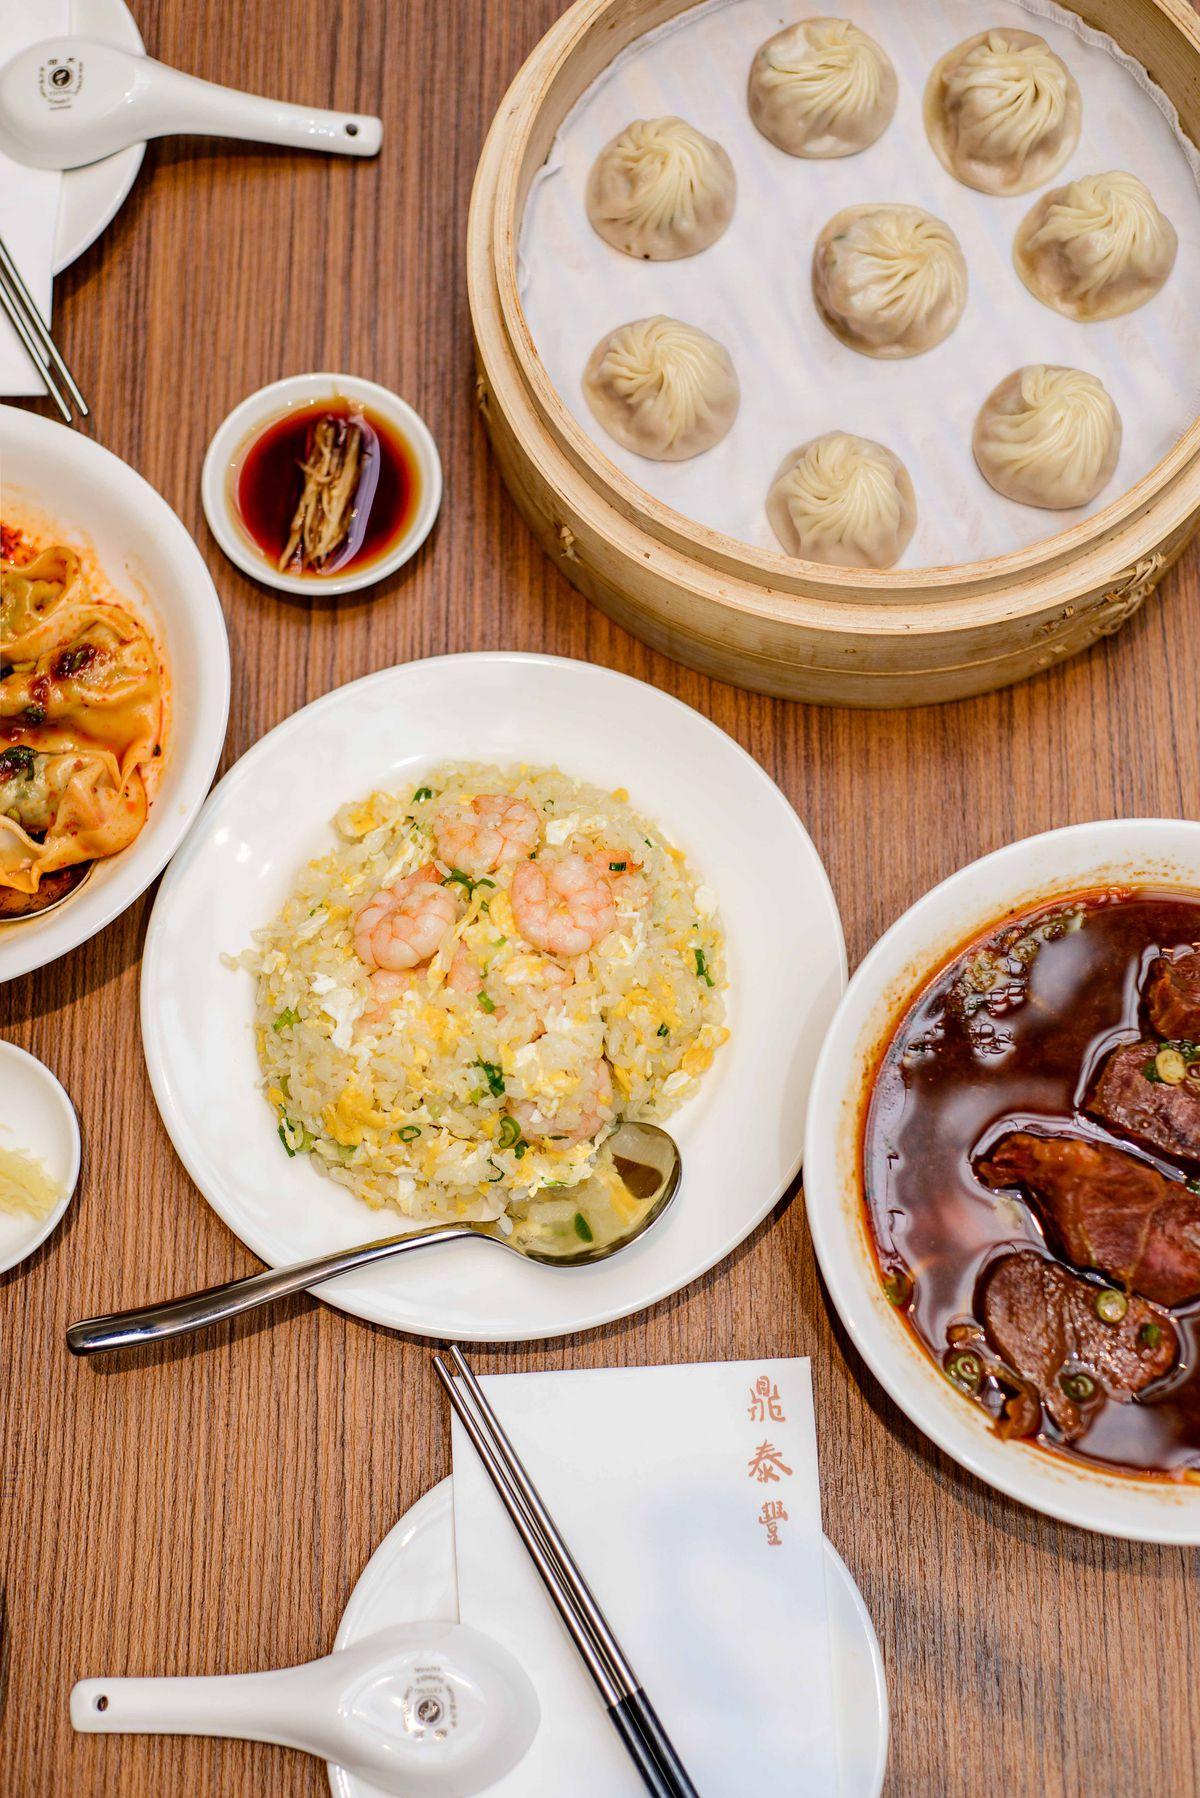 Din Tai Fung's xiaolongbao dumplings are now on the menu in Covent Garden London